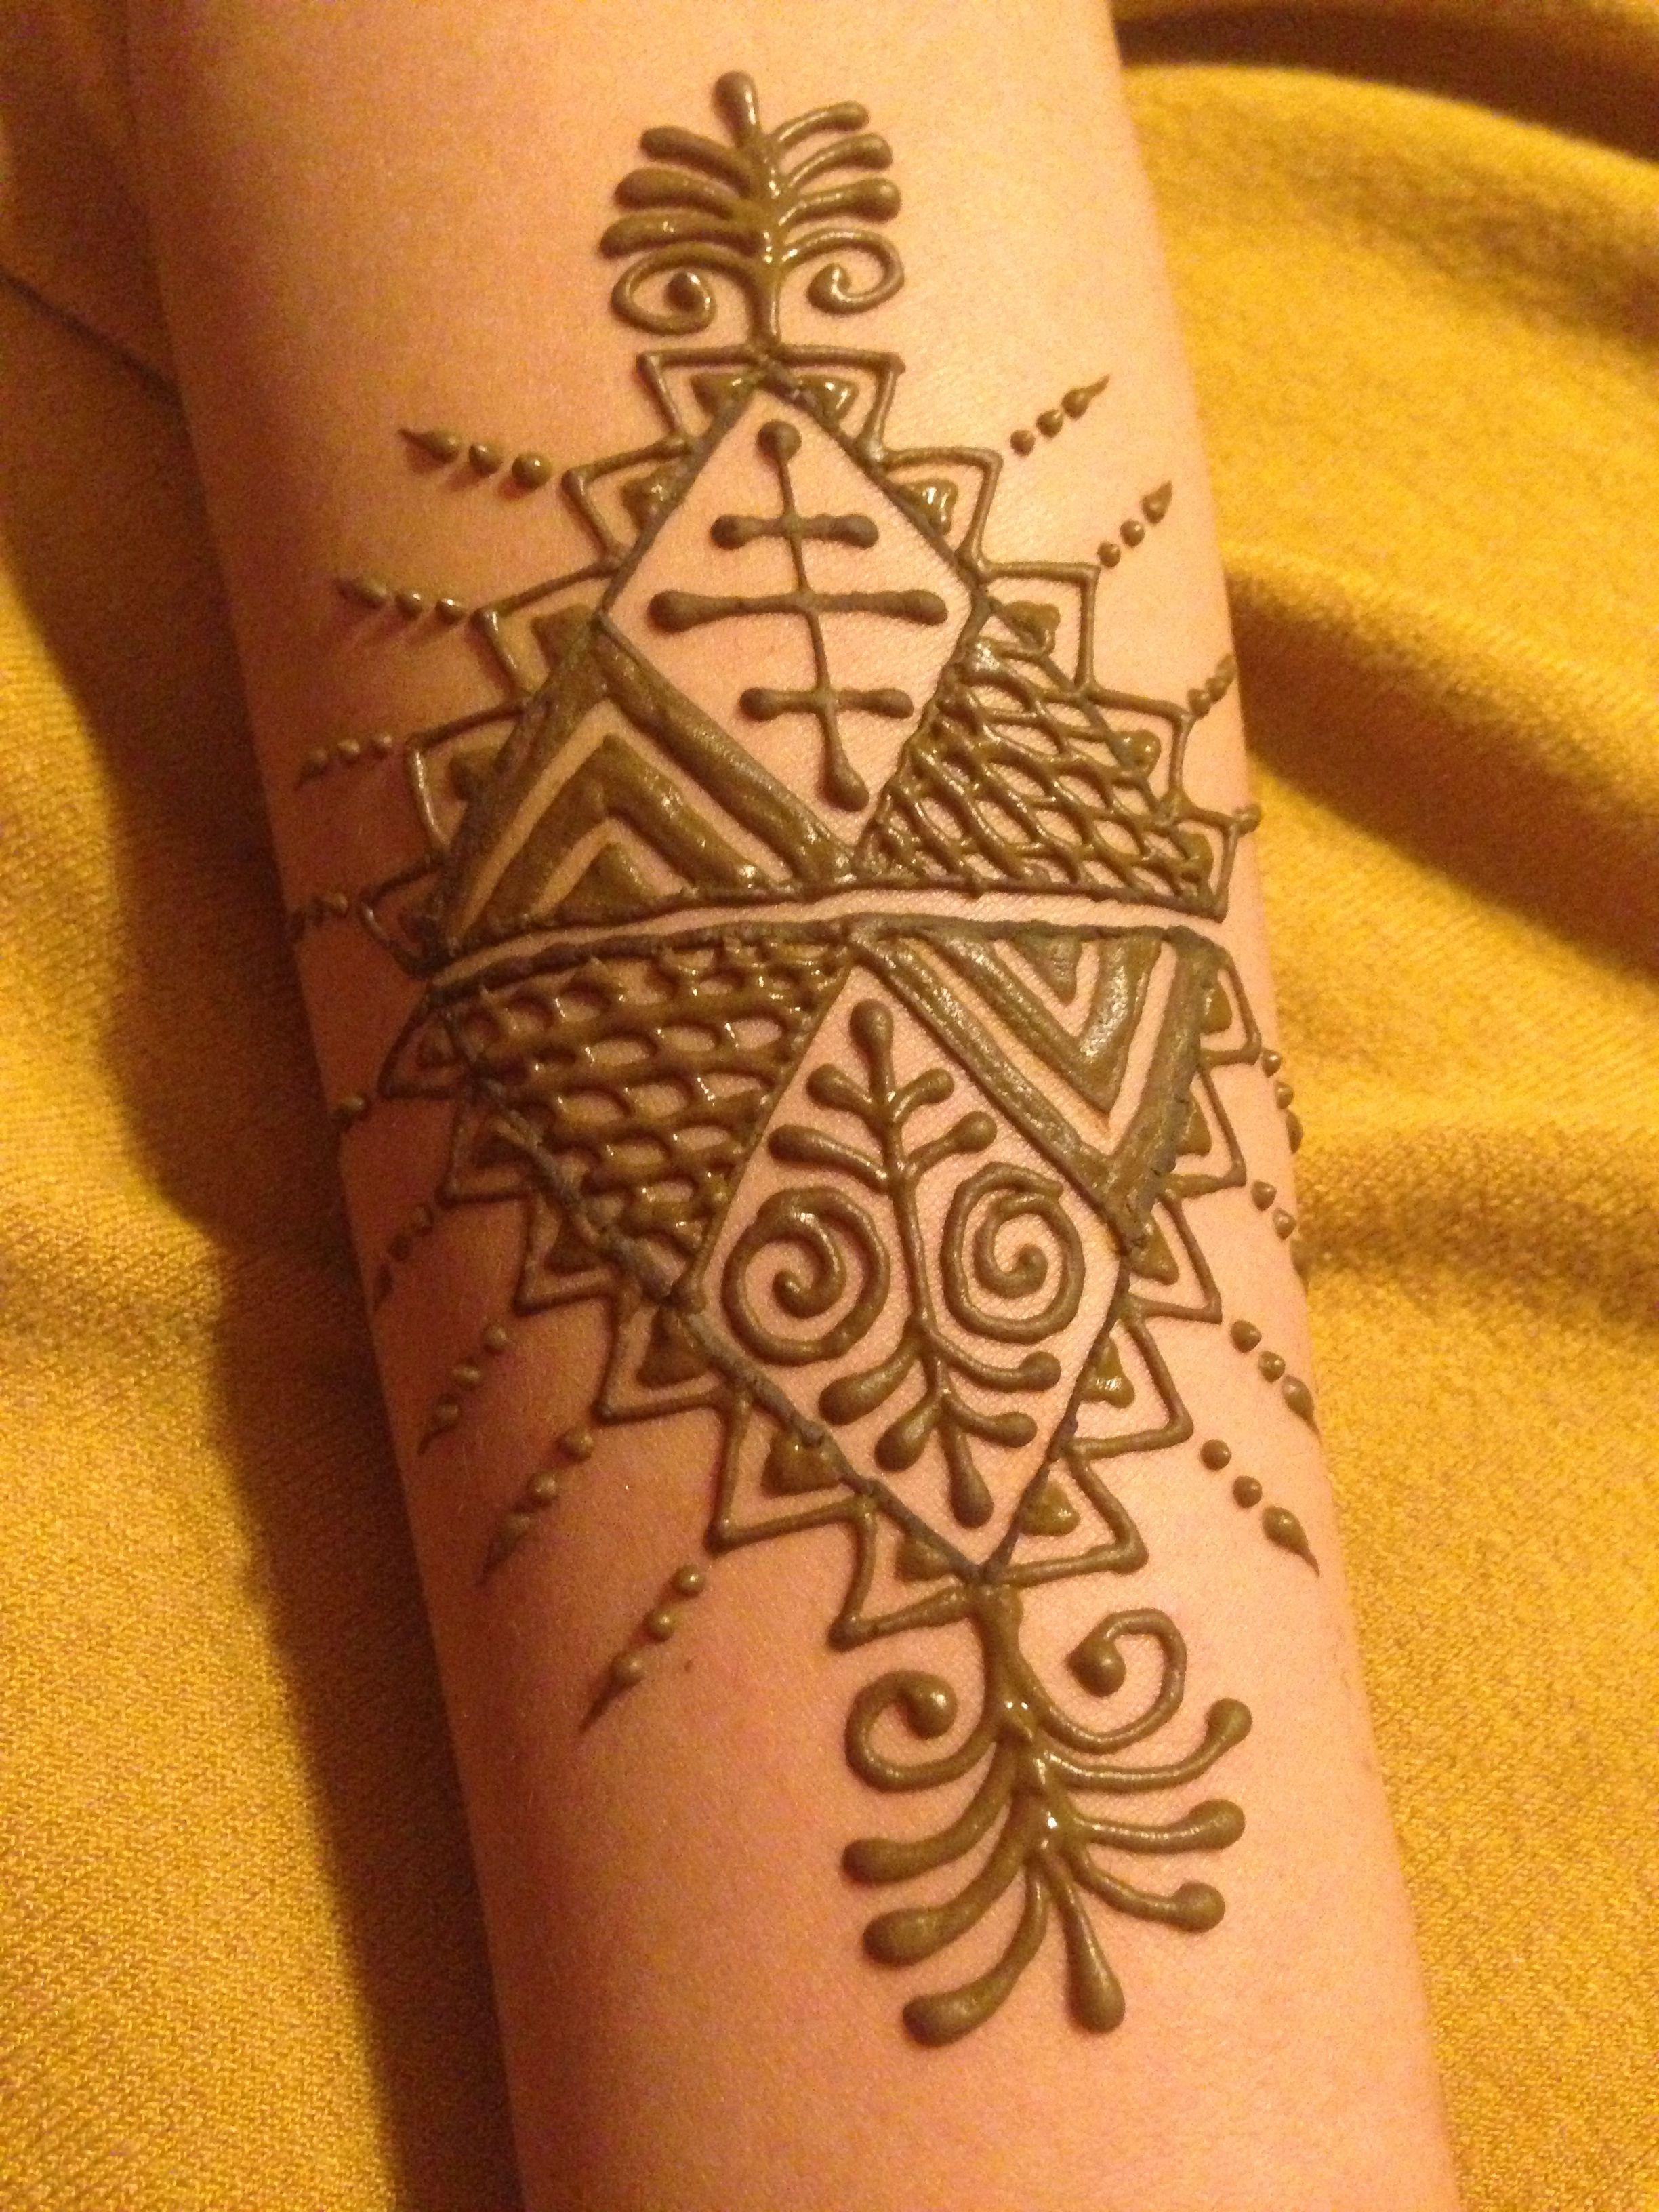 morrocan inspired henna design my henna pinterest henna designs hennas and mehndi. Black Bedroom Furniture Sets. Home Design Ideas